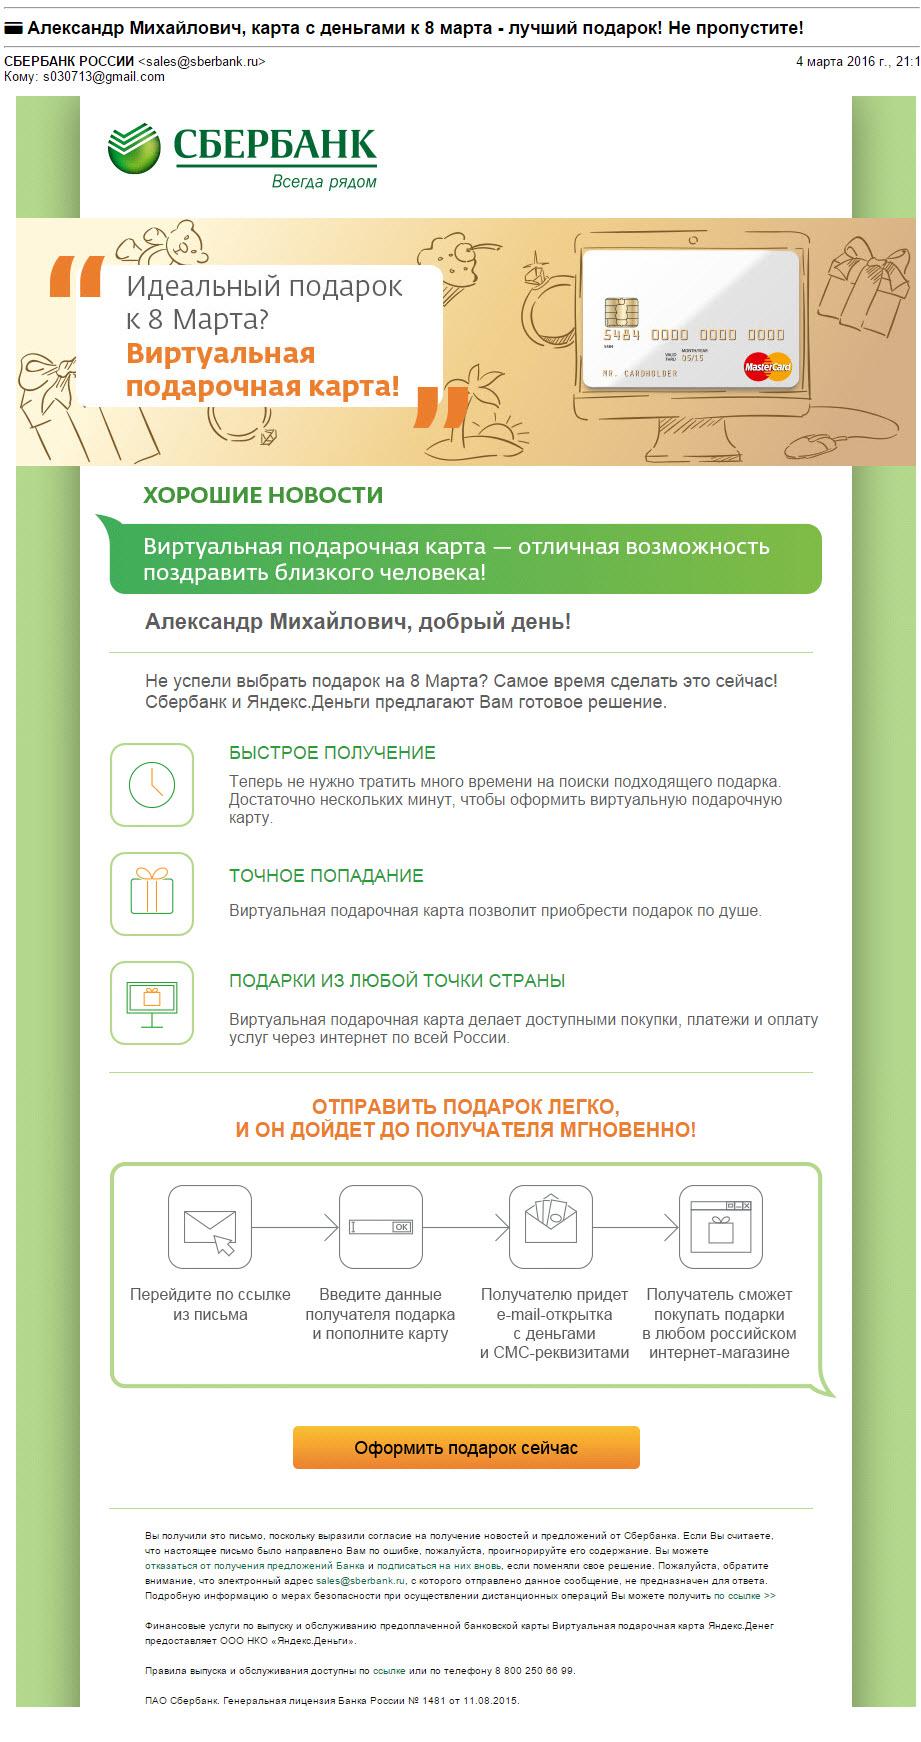 Email-рассылка Сбербанка - виртуальная карта